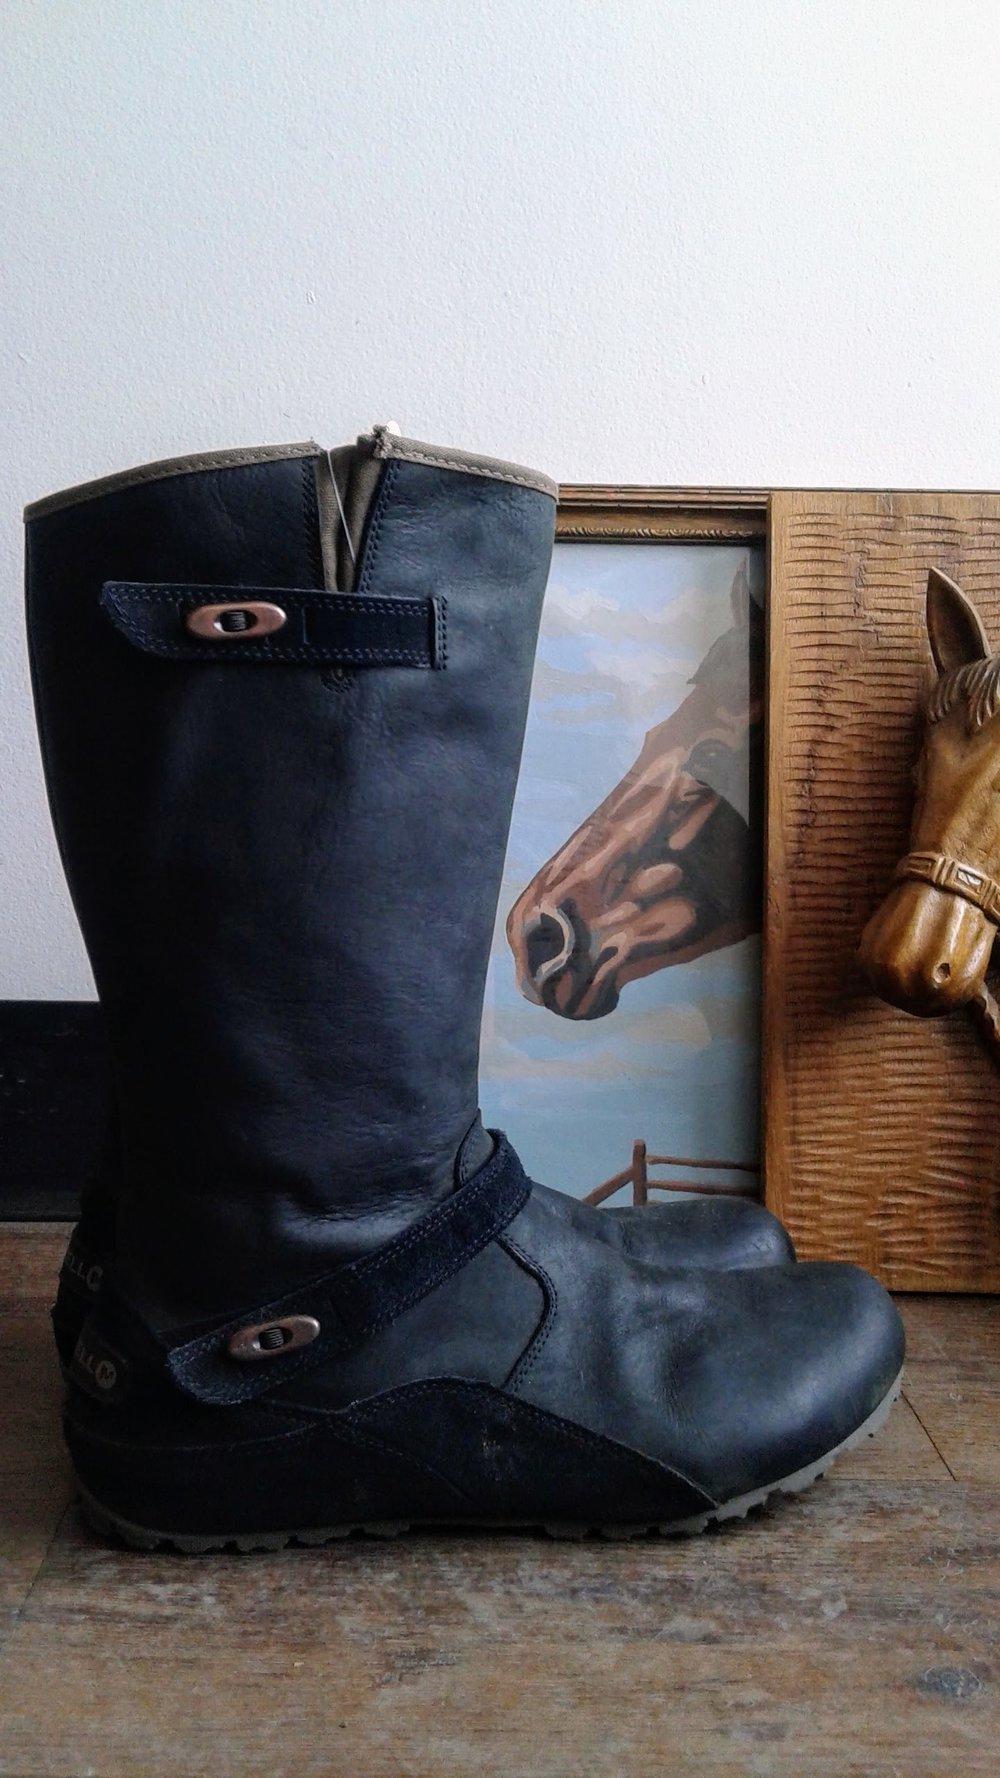 Merrel boots; S10, $110